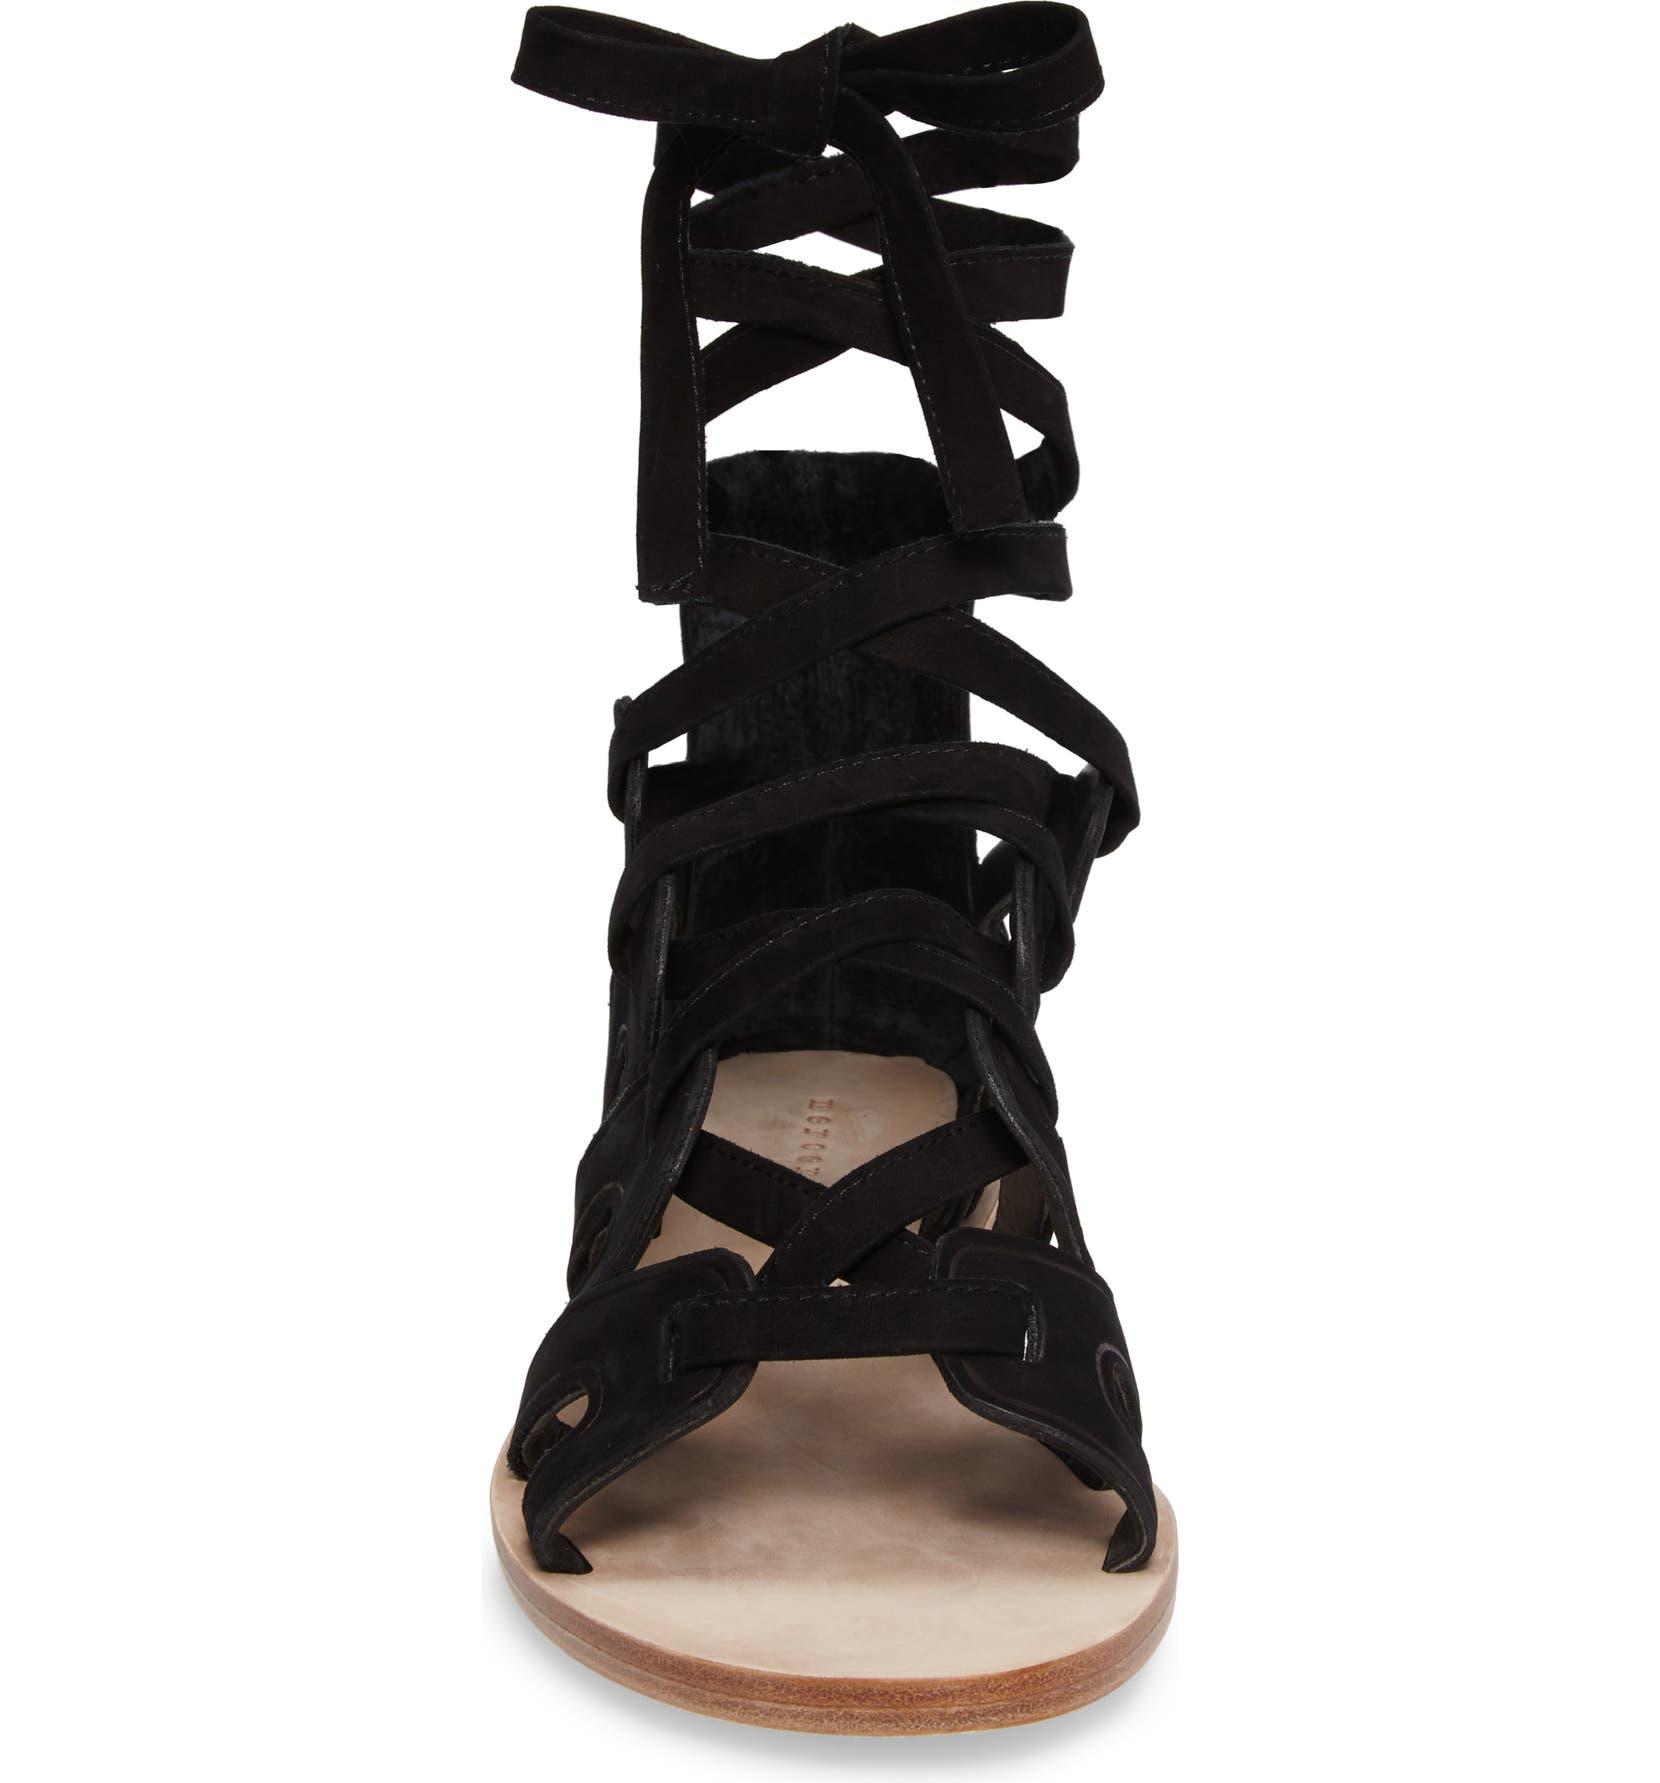 bfd98f57f Mercer Edit EZonthei Gladiator Sandal (Women)